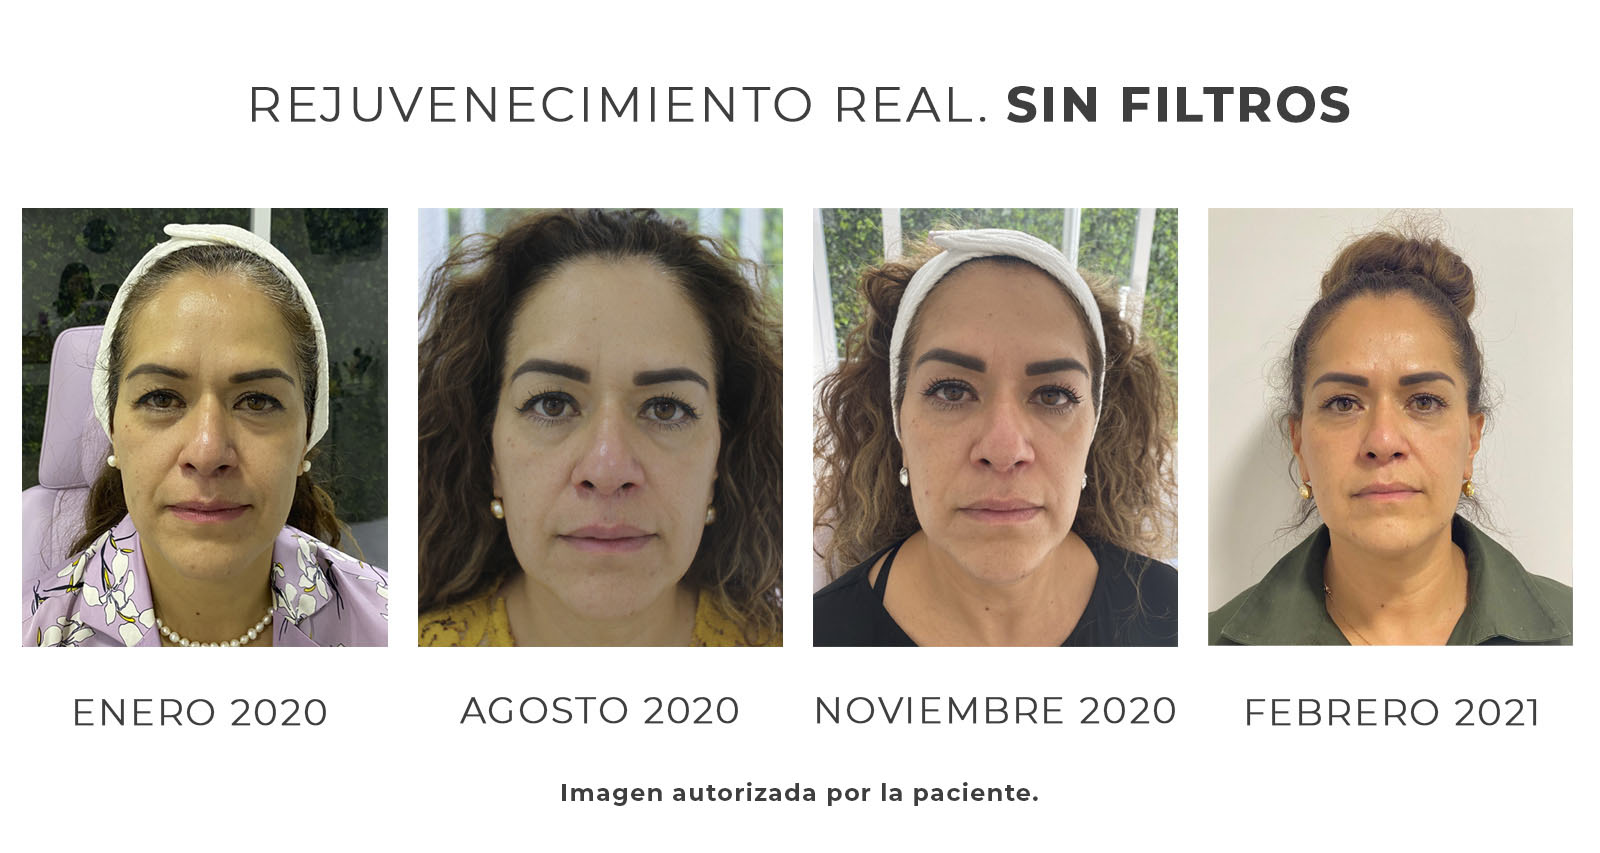 rejuvenece-sin-filtros1